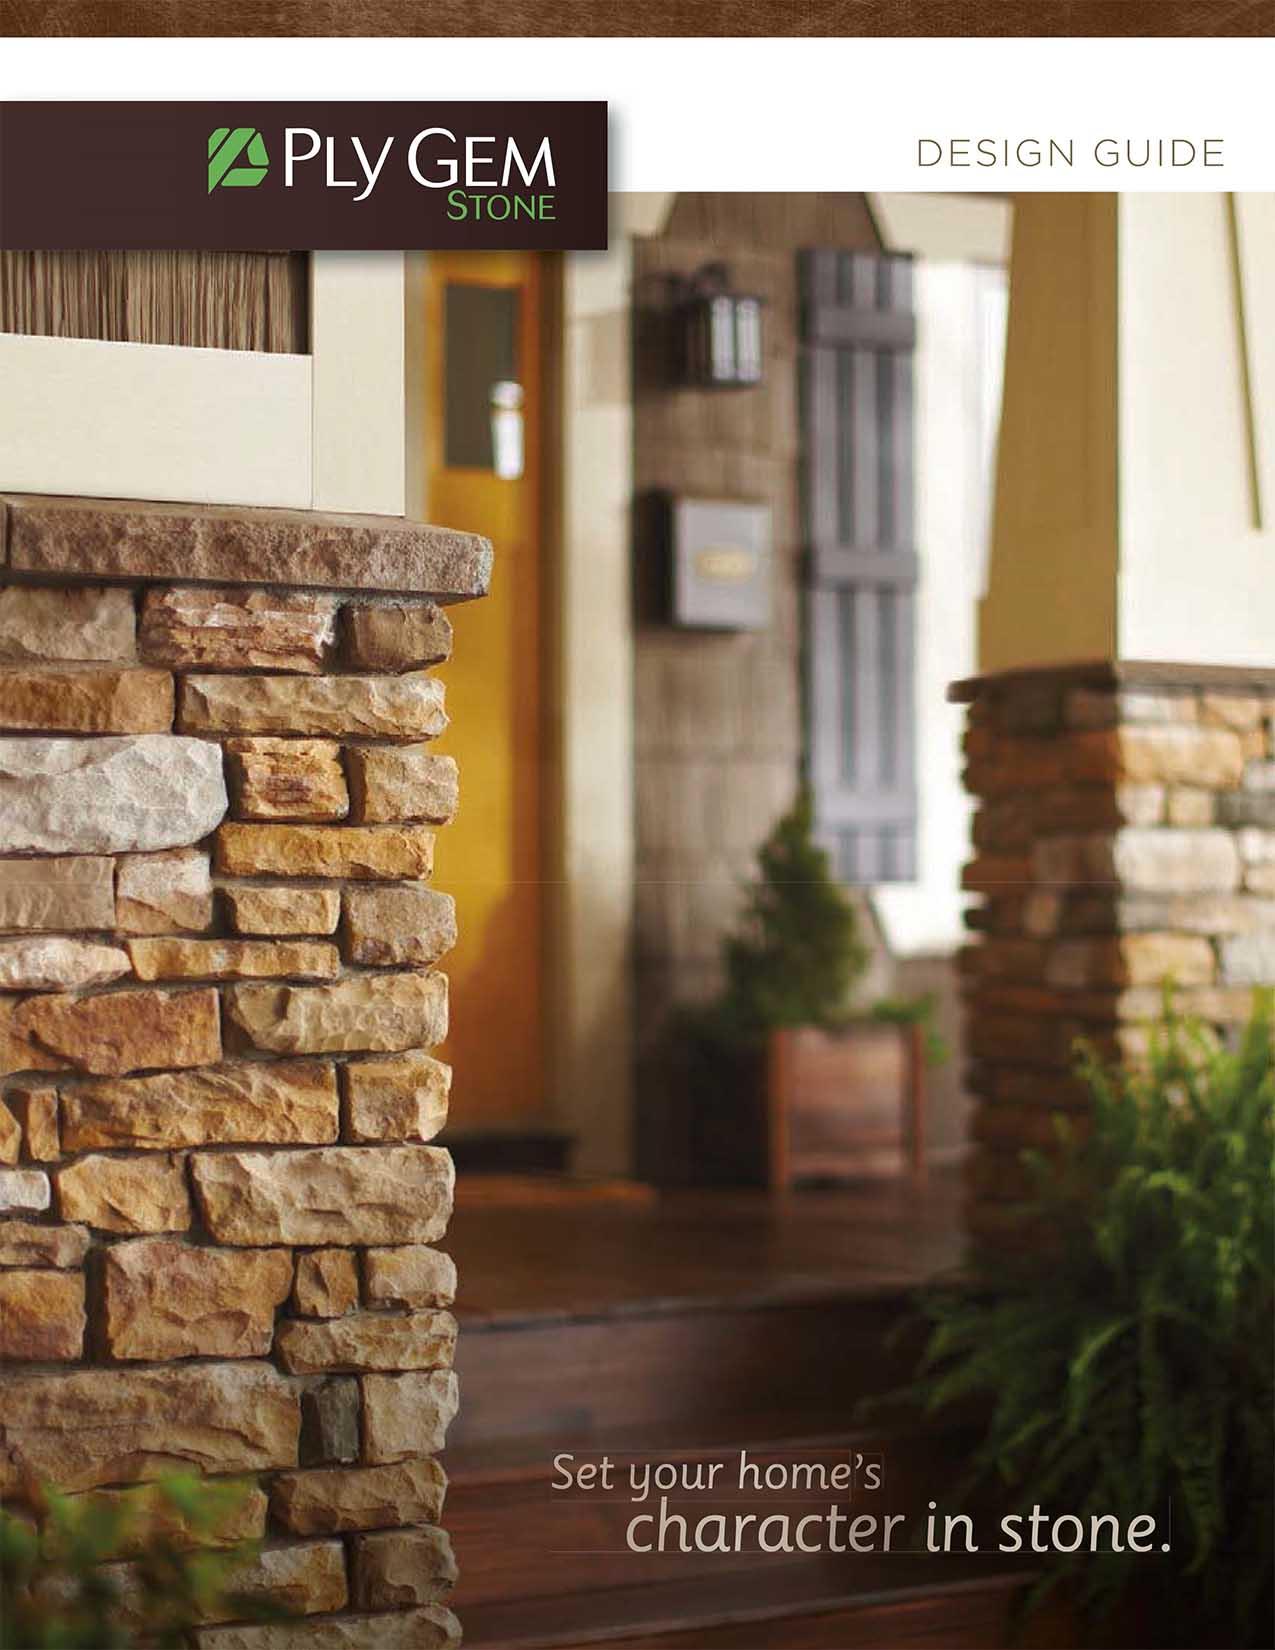 Ply Gem Patio Doors: DeMarco Brothers Landscape Supplies